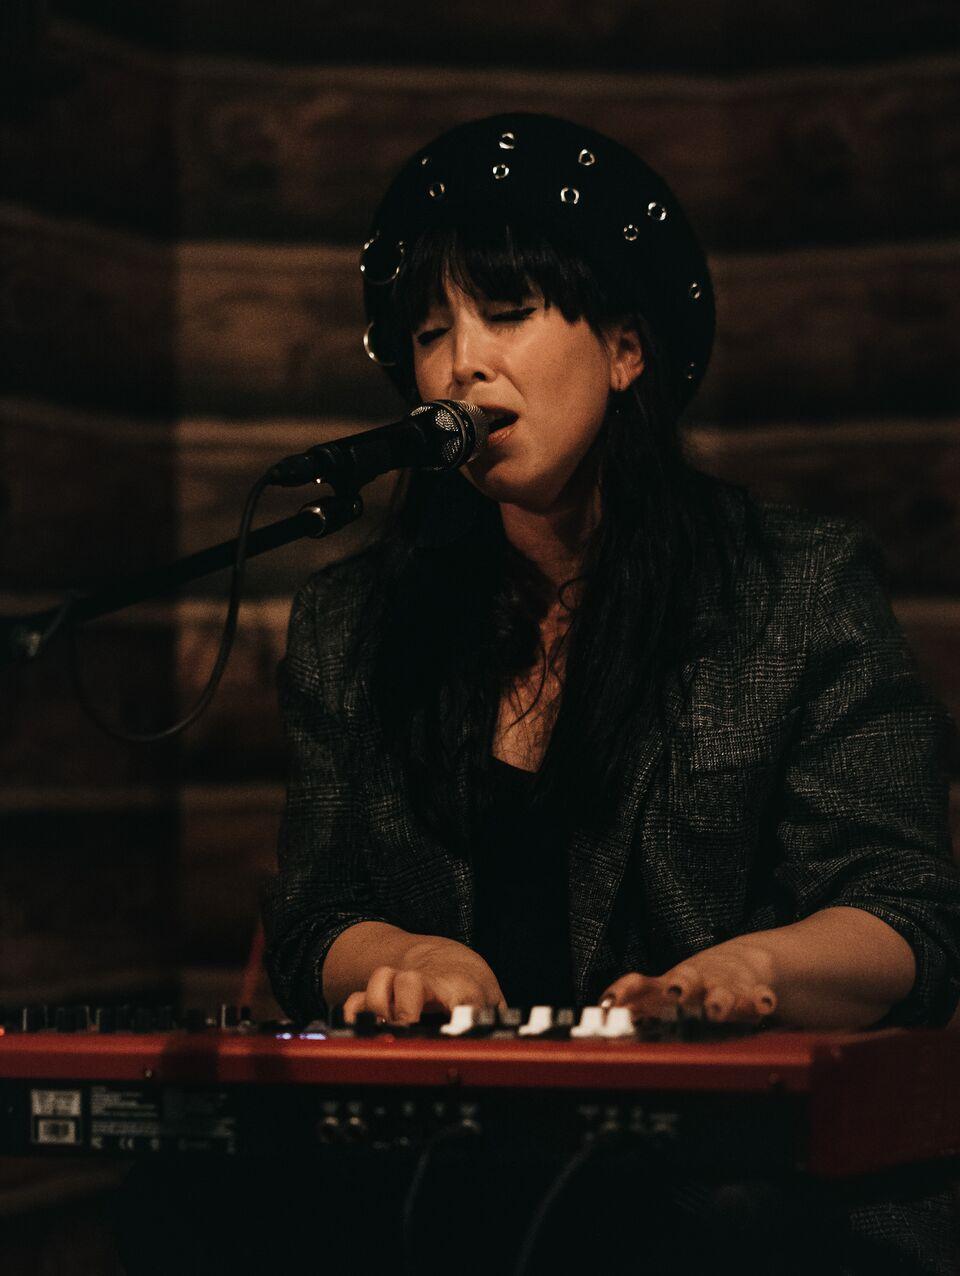 LIVE REVIEW: Katy Steele – Junk Bar – ThomasBleach